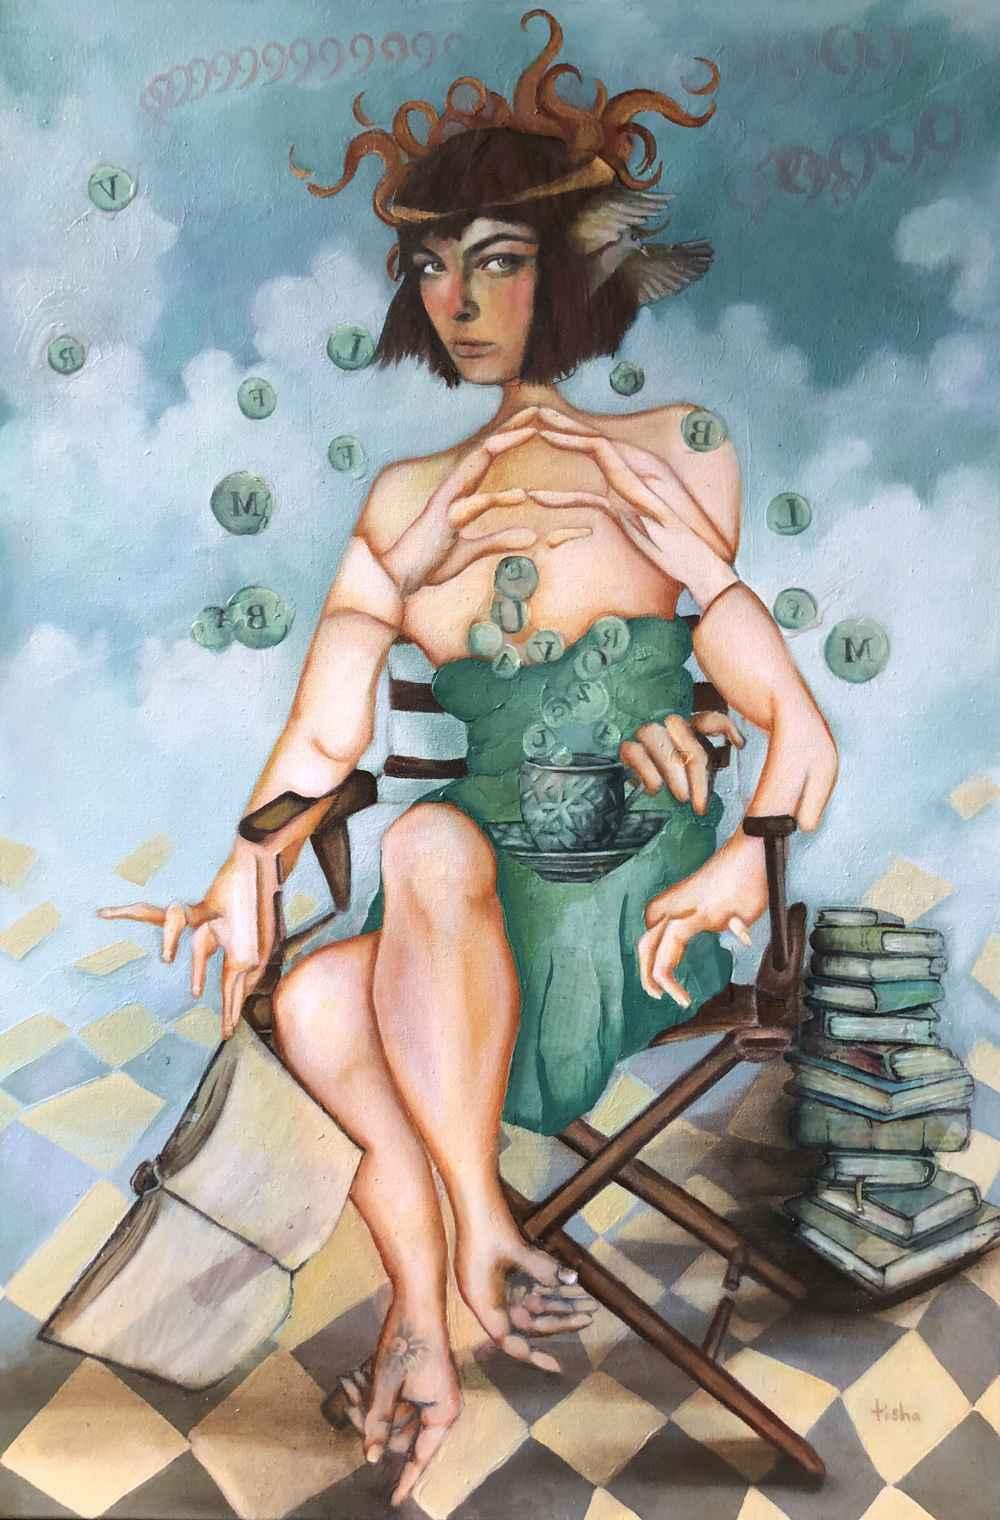 Tear Water Tea by  Tisha Weddington - Masterpiece Online